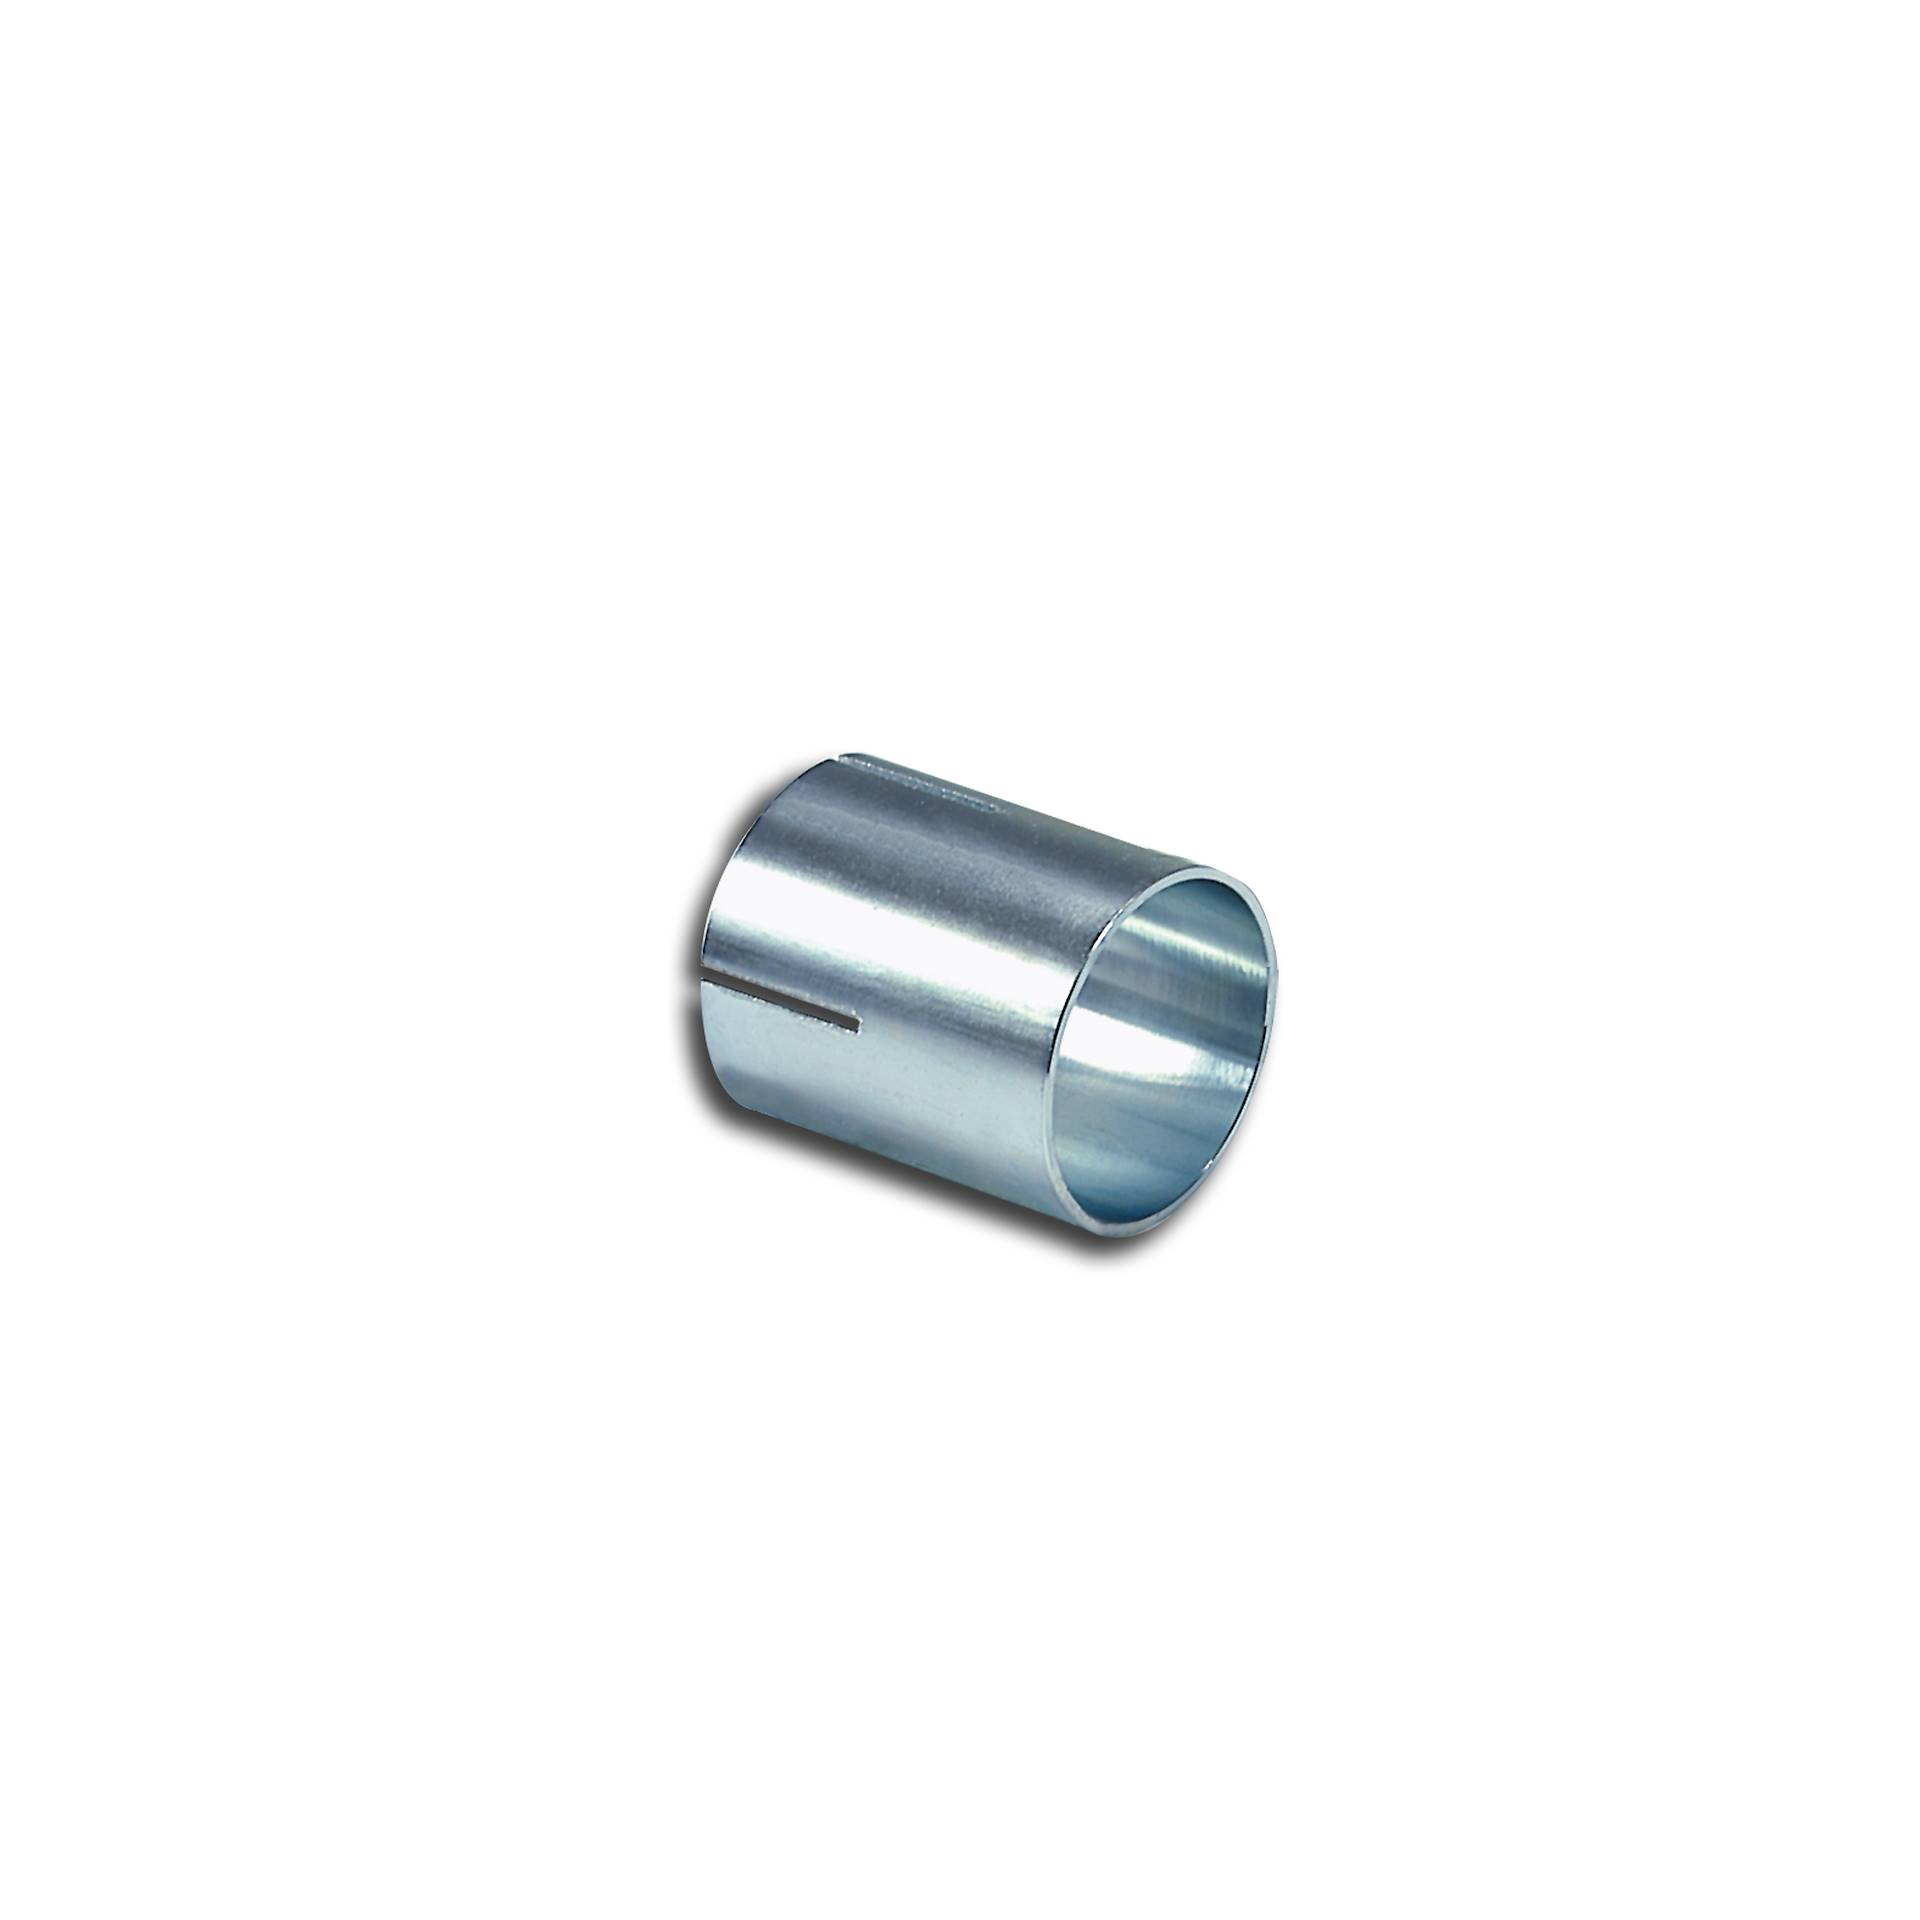 Supersprint | Prodlužovací trubka - Mini Cooper D (F54), 2.0d, 2015->, 833133 (Prodlužovací trubka)